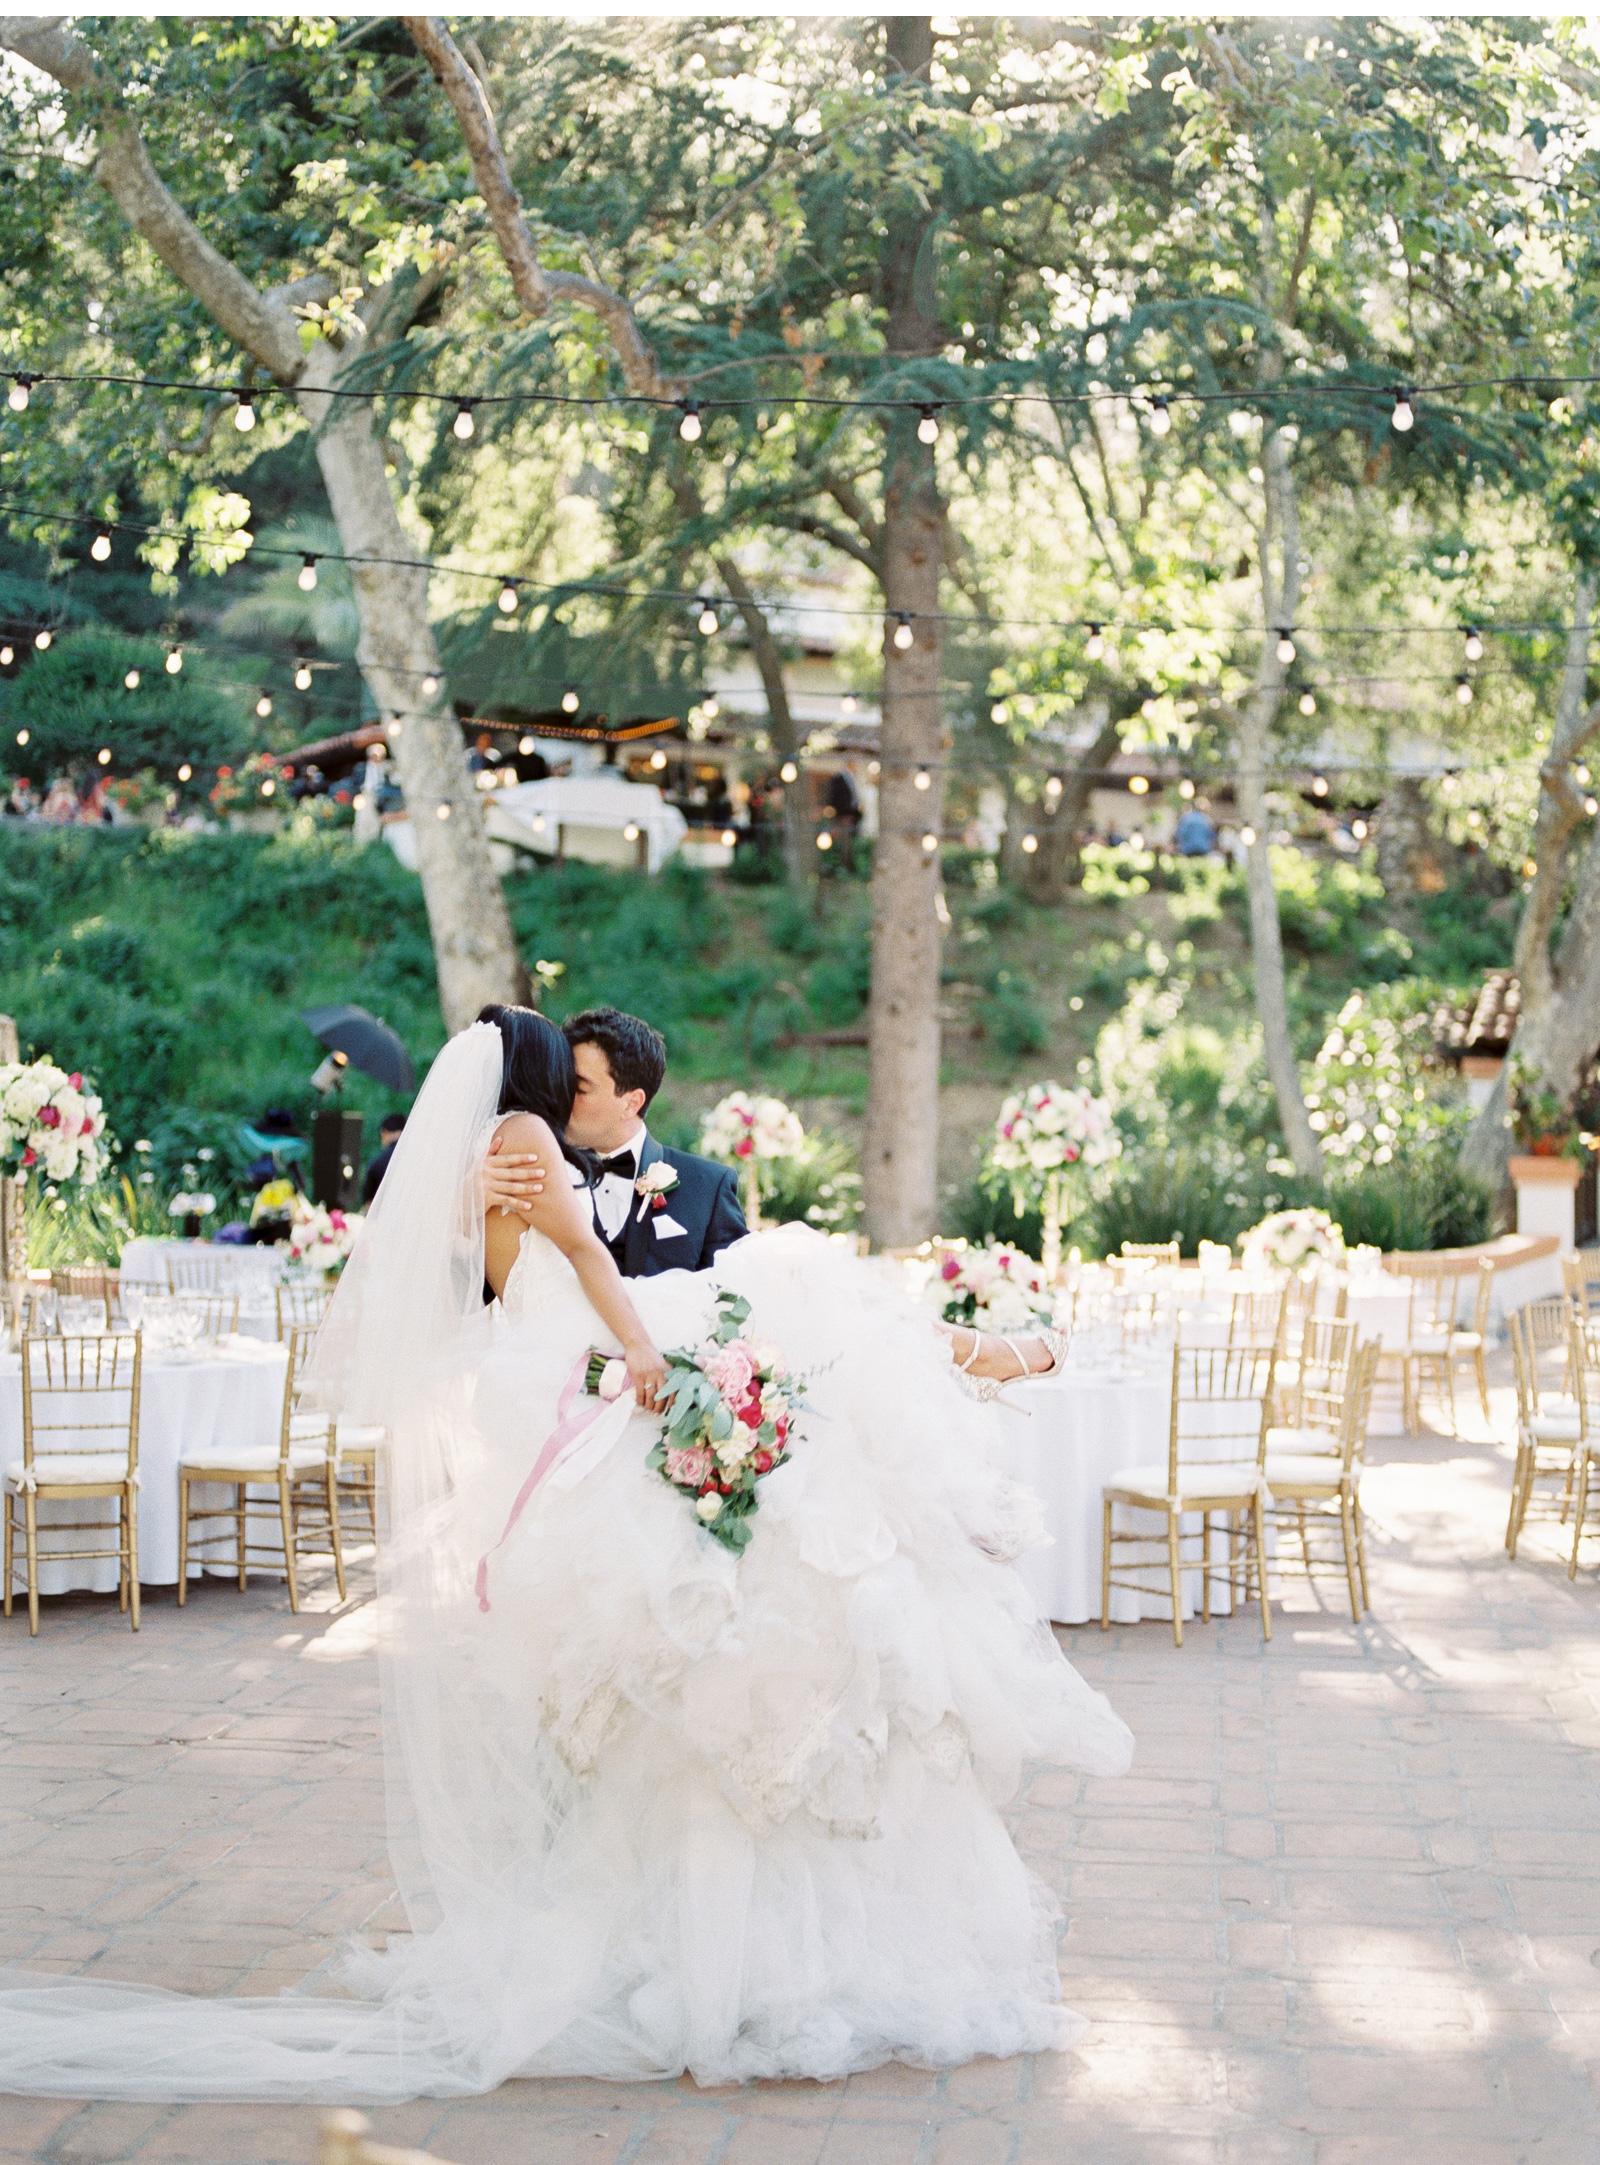 Rancho-Las-Lomas-Wedding-Natalie-Schutt-Photography_03.jpg